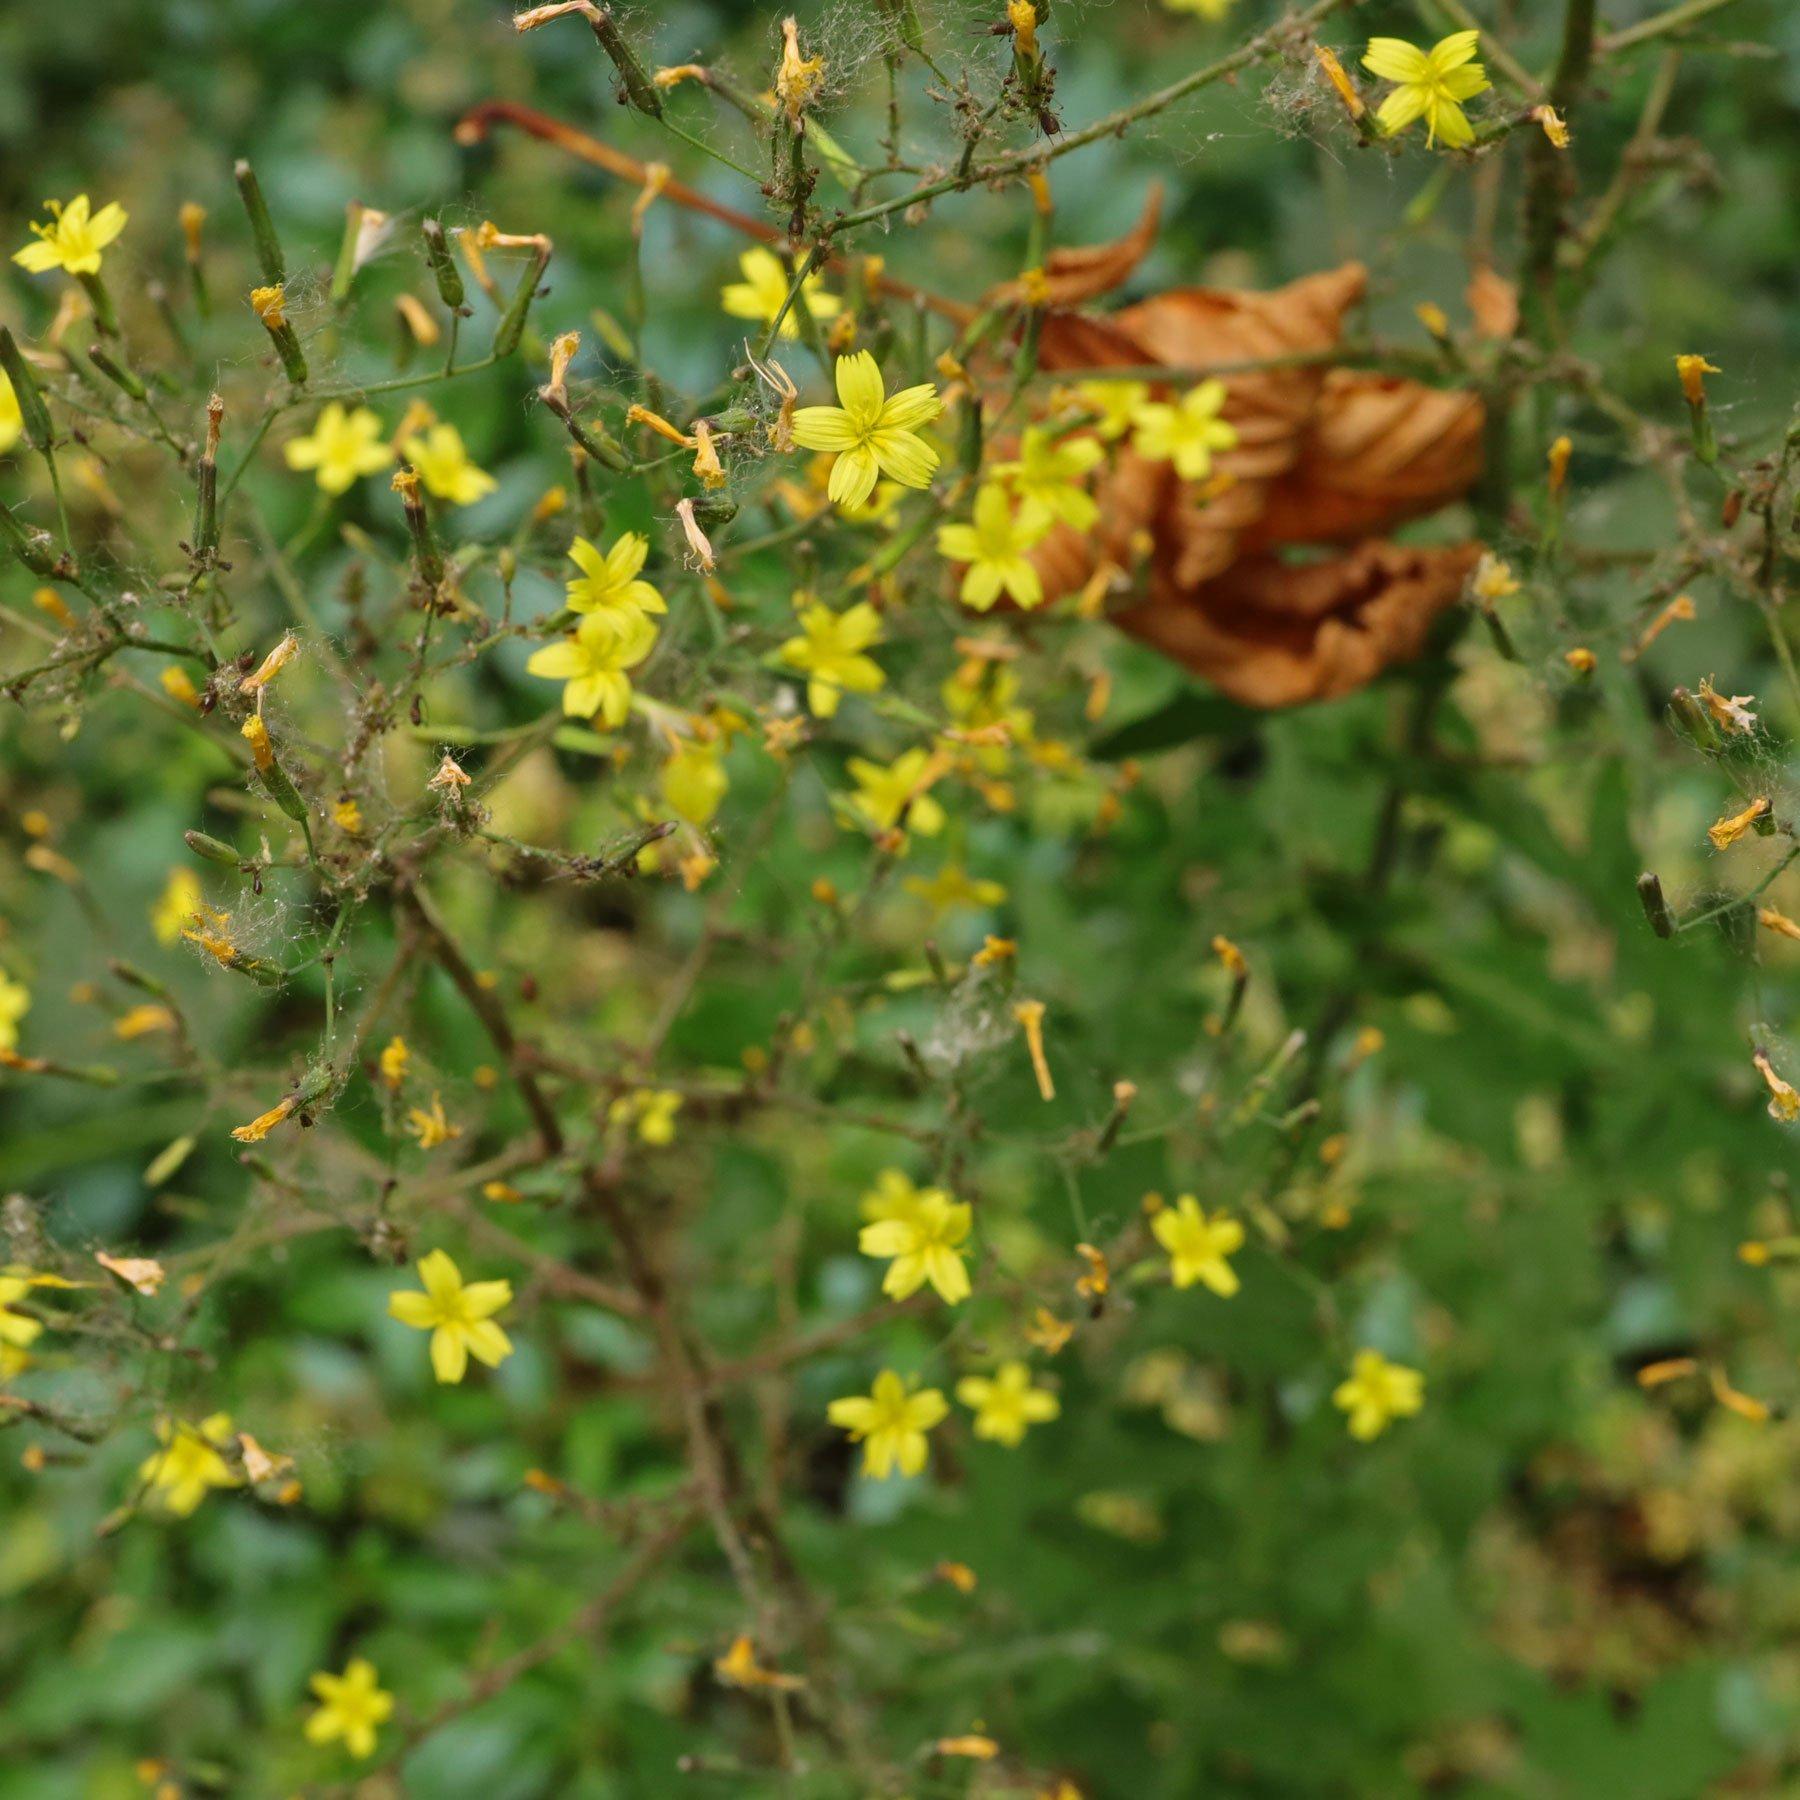 Mauerlattich Blüten